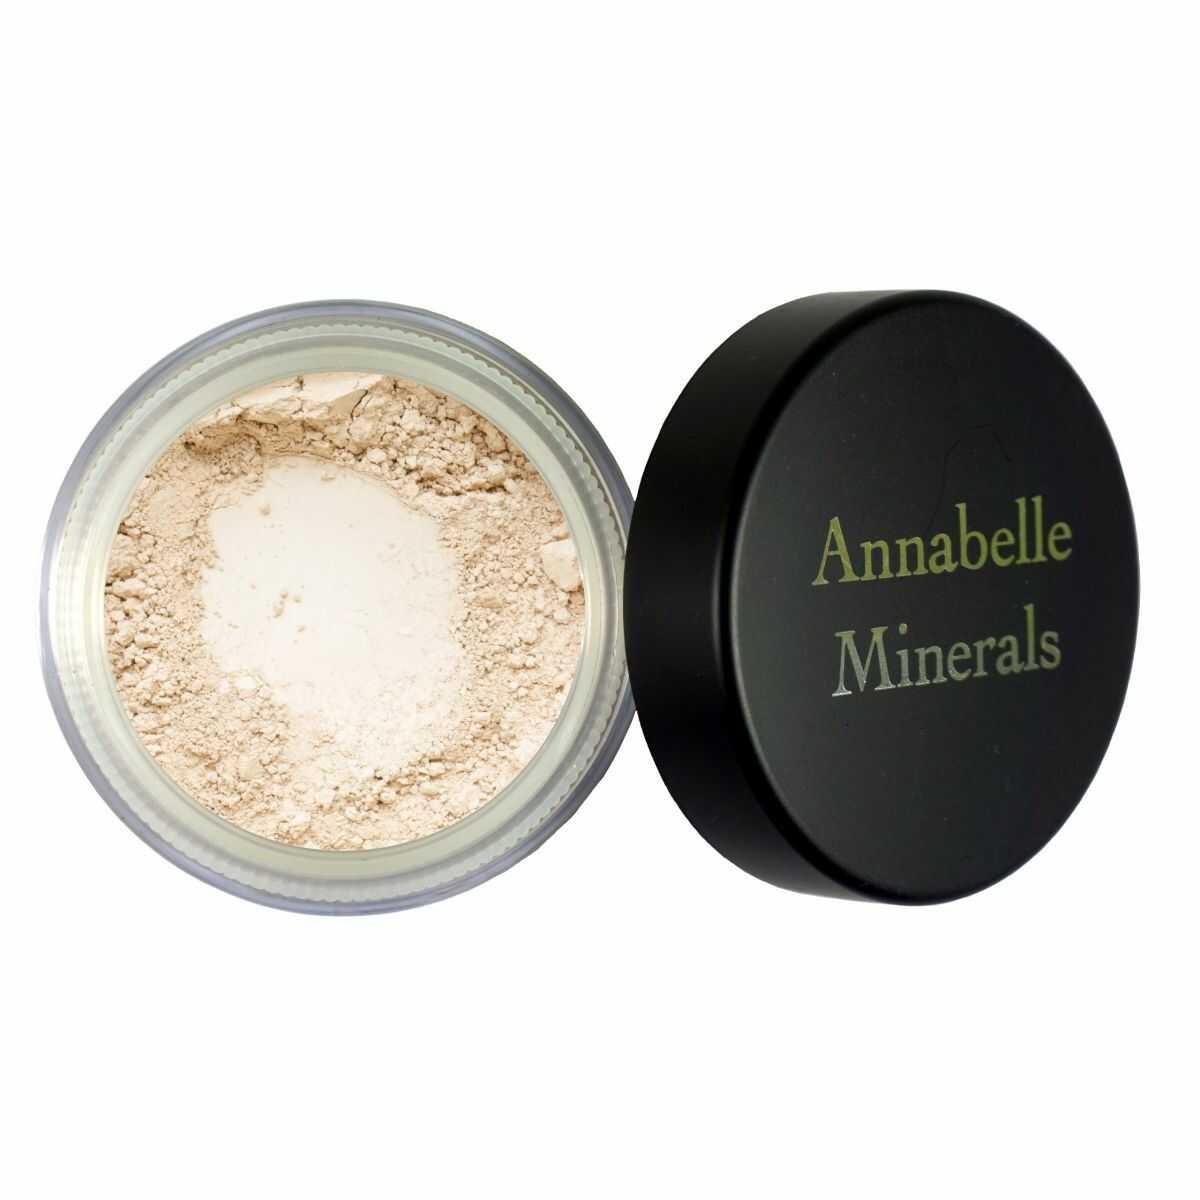 Podkład mineralny - kryjący Natural Light - 10g - Annabelle Minerals